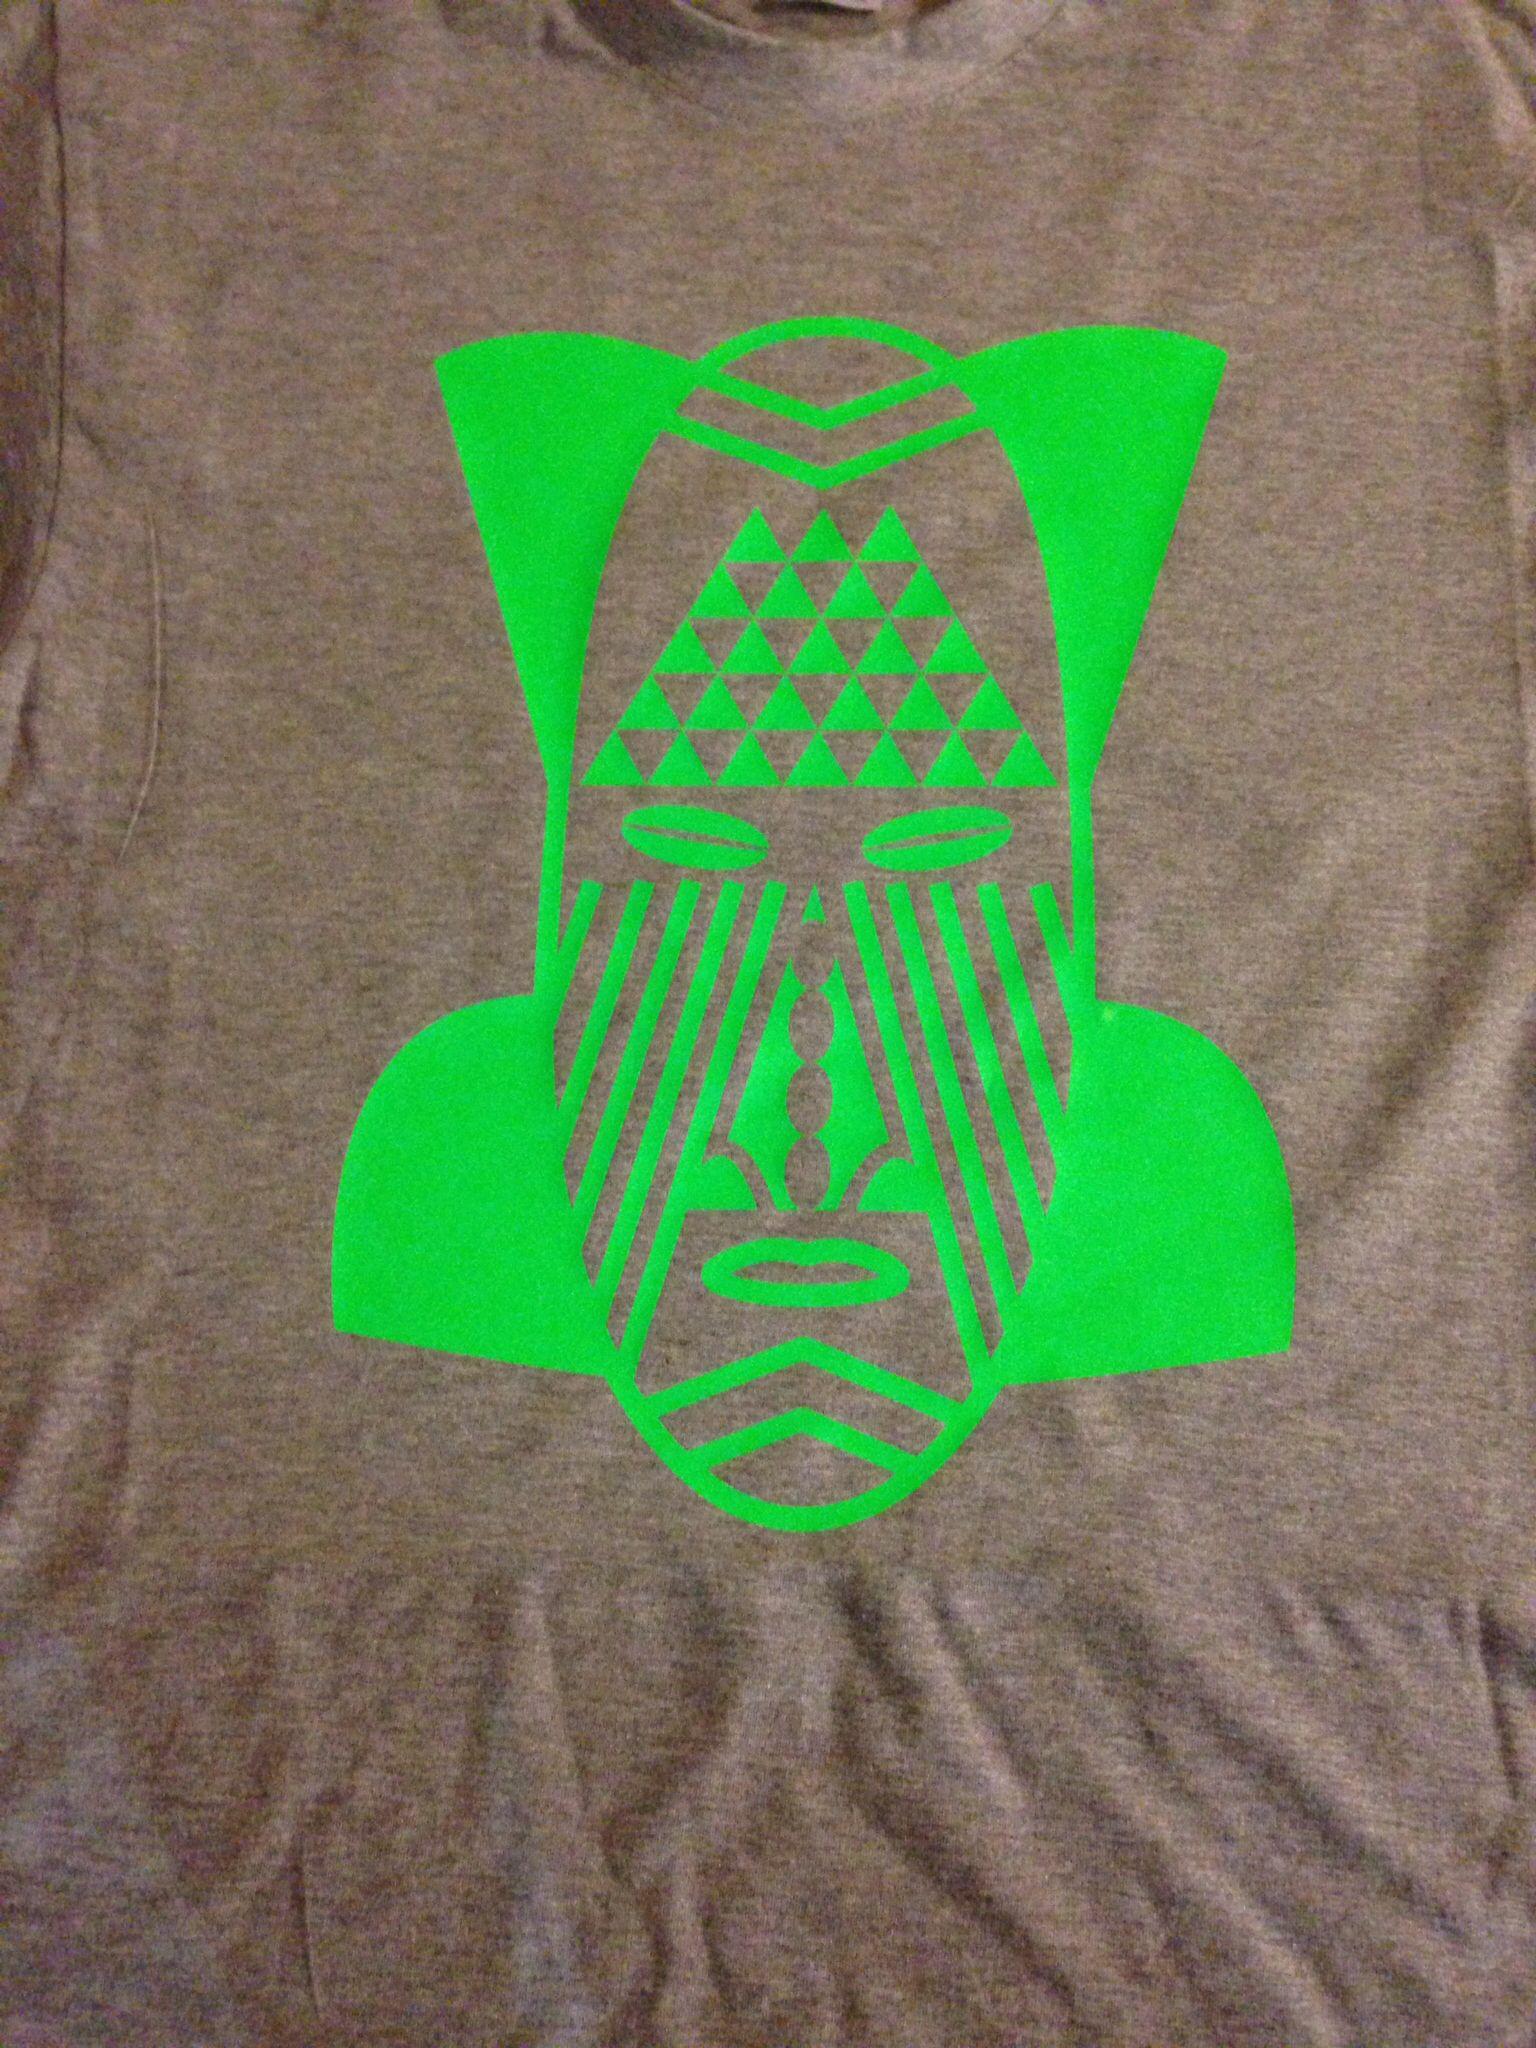 New MASK on Shirt